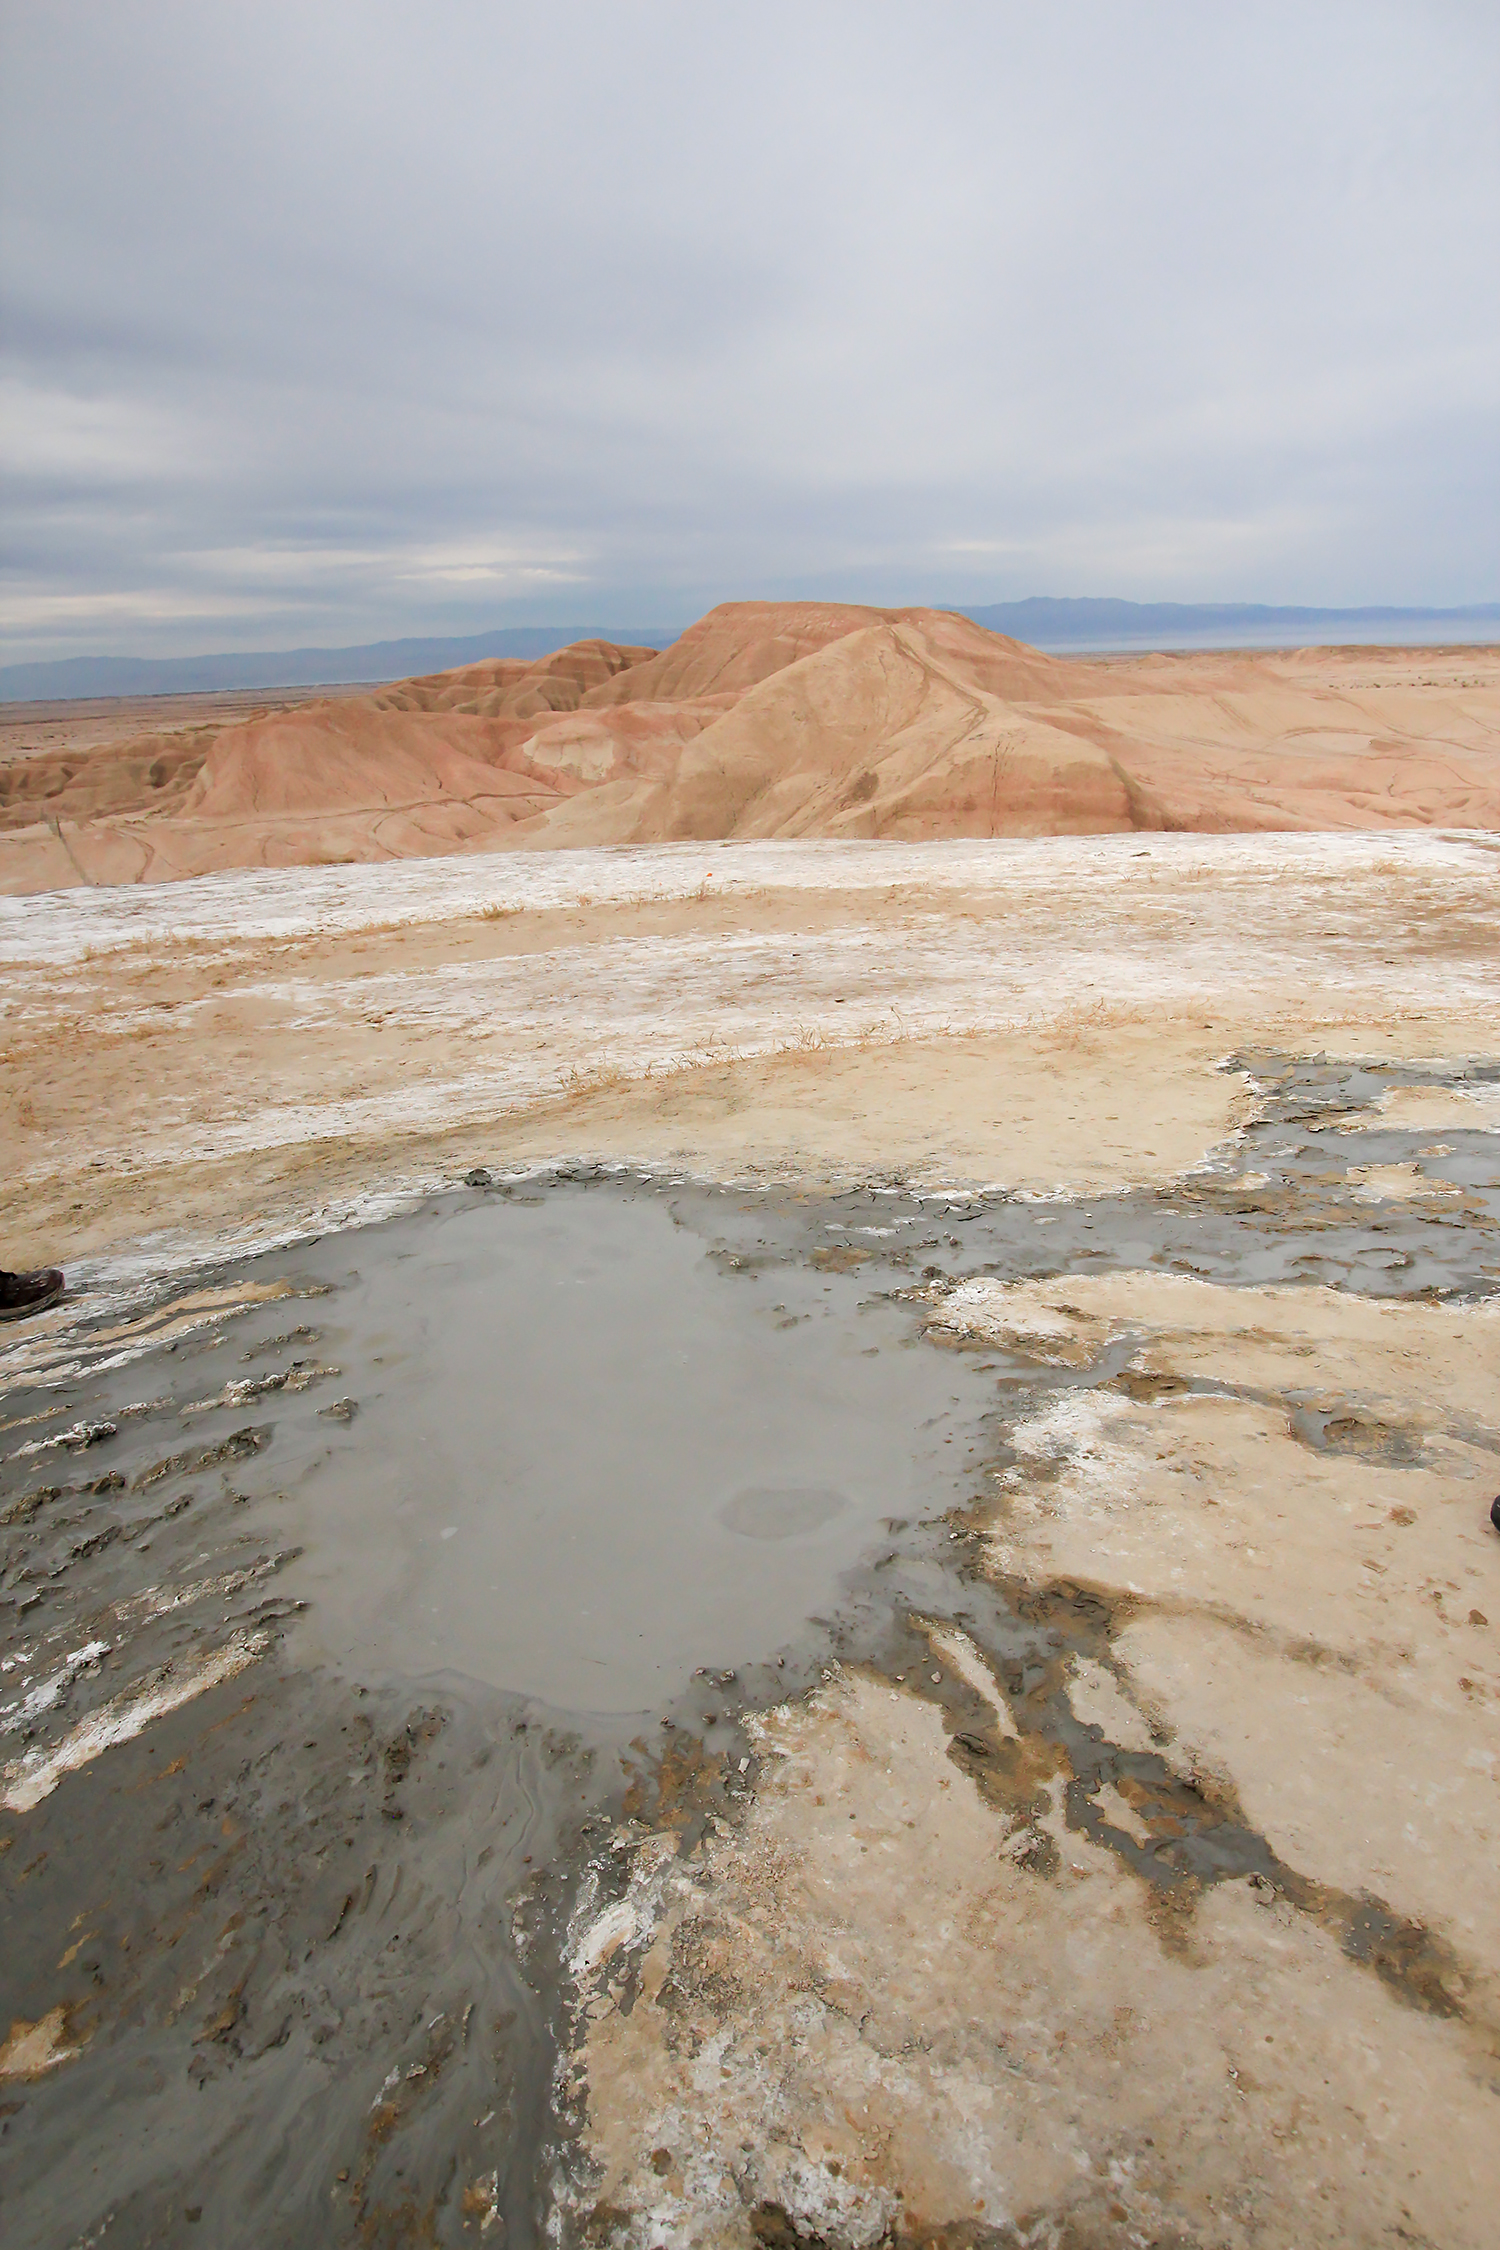 The Gas Domes: volcano-like mud pots